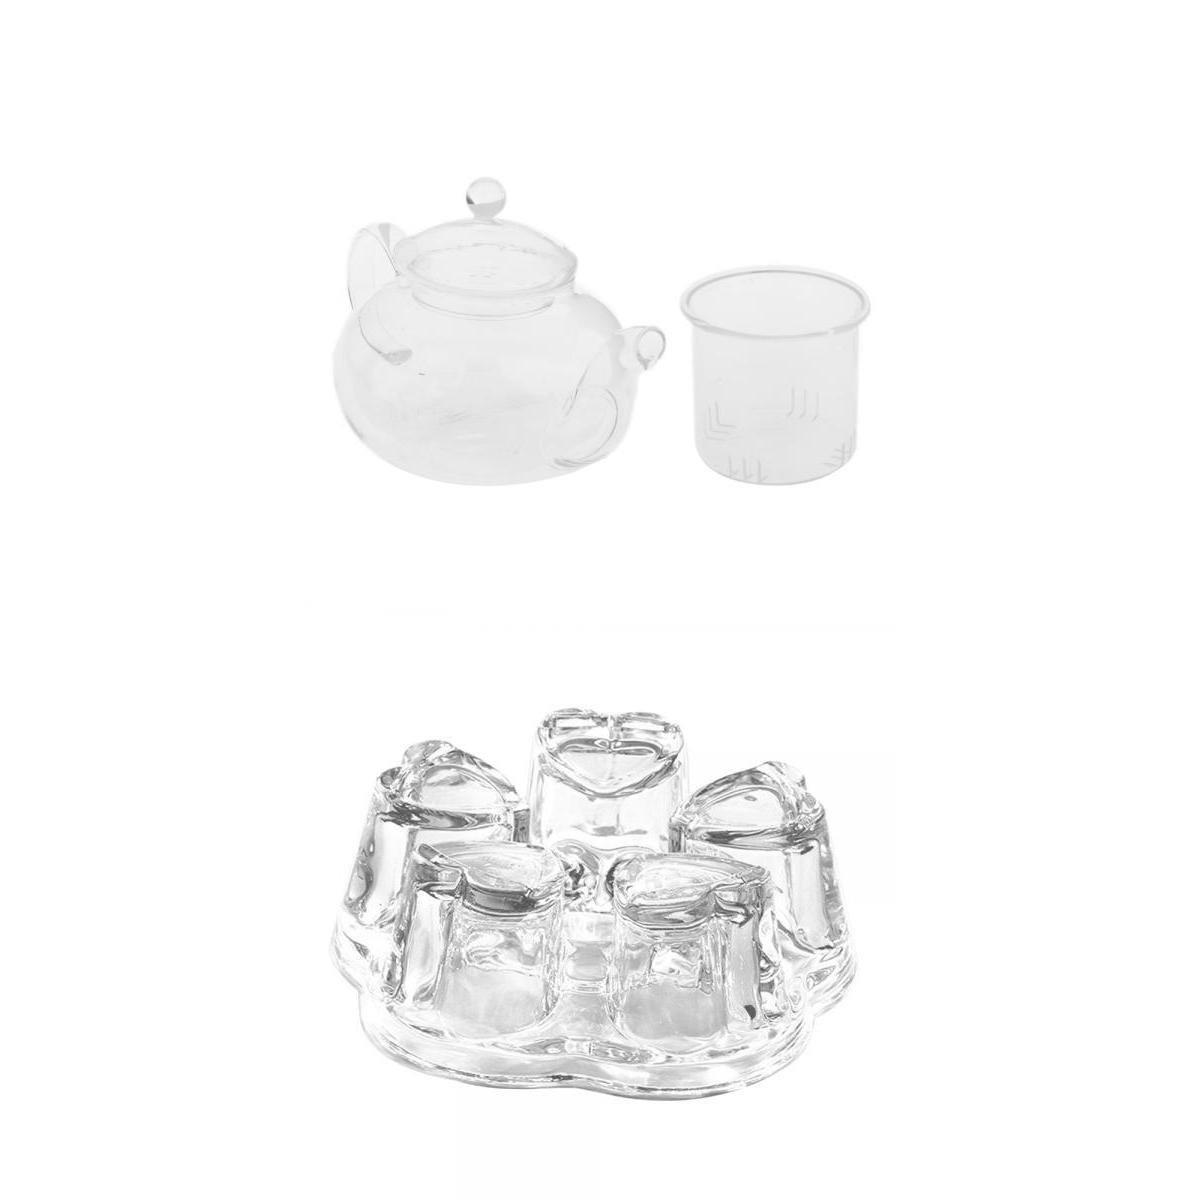 MagiDeal Heat Resistant Glass Teapot with Infuser Coffee Tea Leaf Herbal Warmer Kit